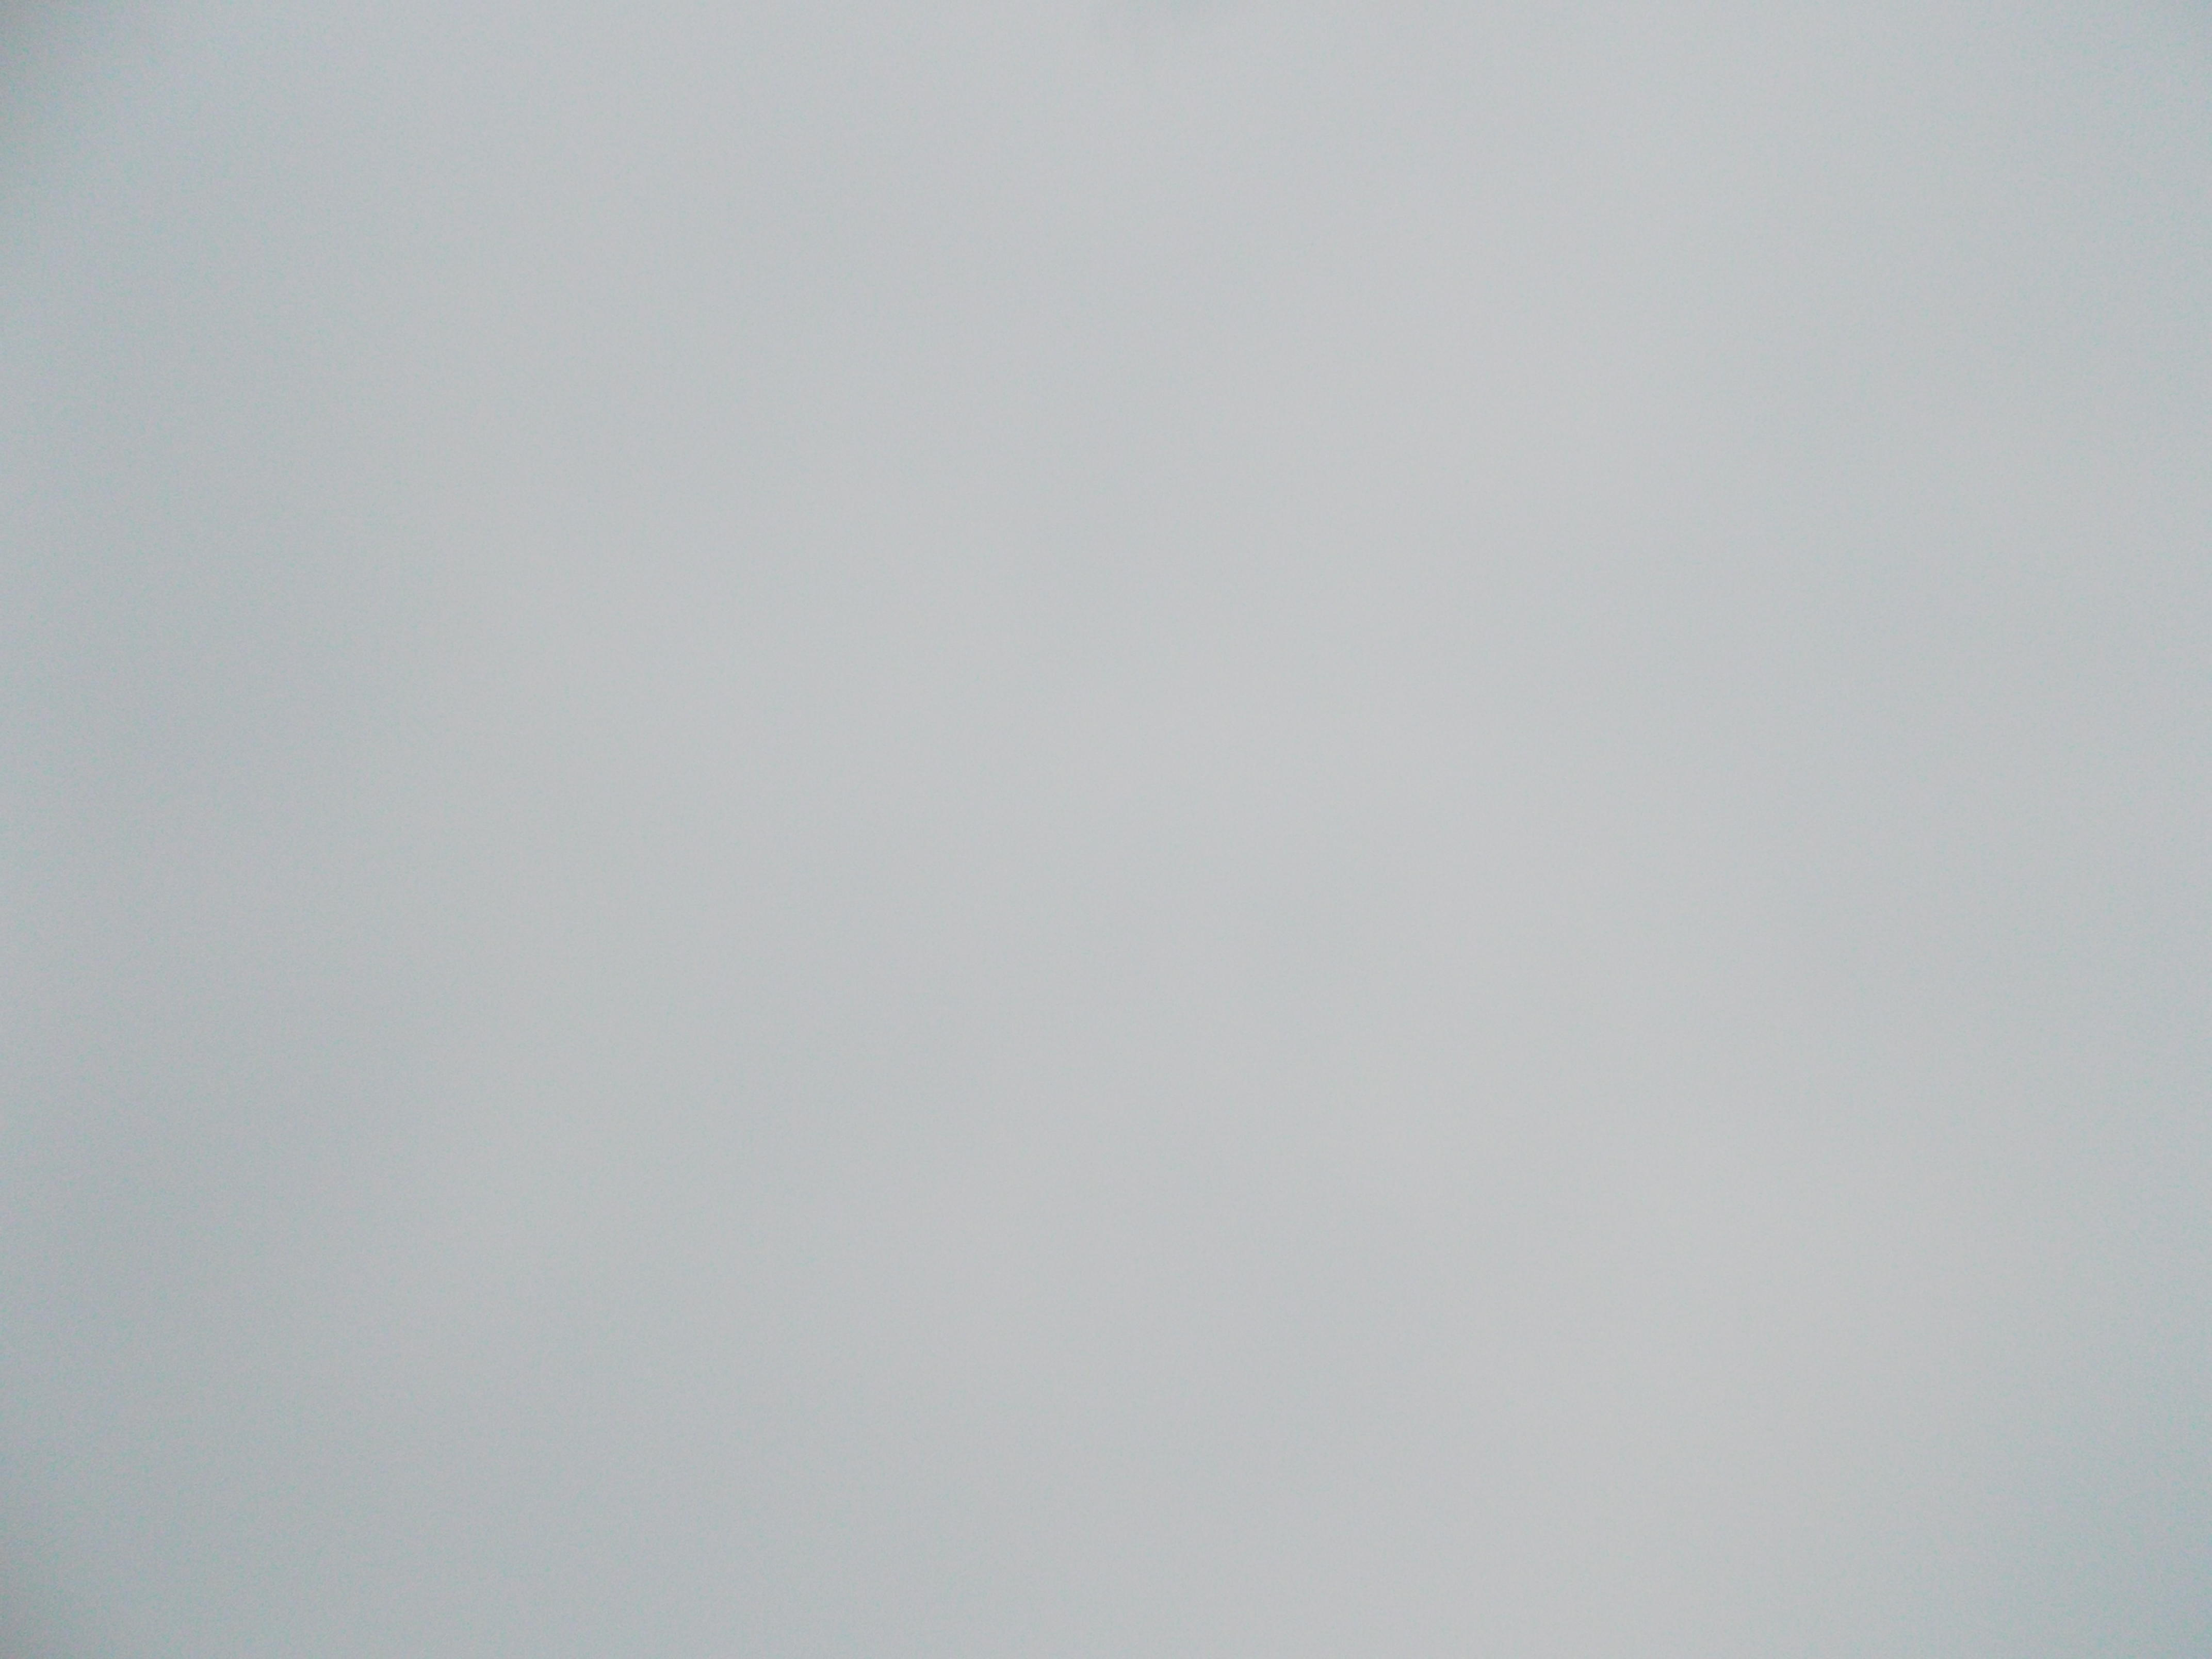 2013-04-04 Longitude -0.371 Latitude 49.182 Altitude 29 Heure 11h42